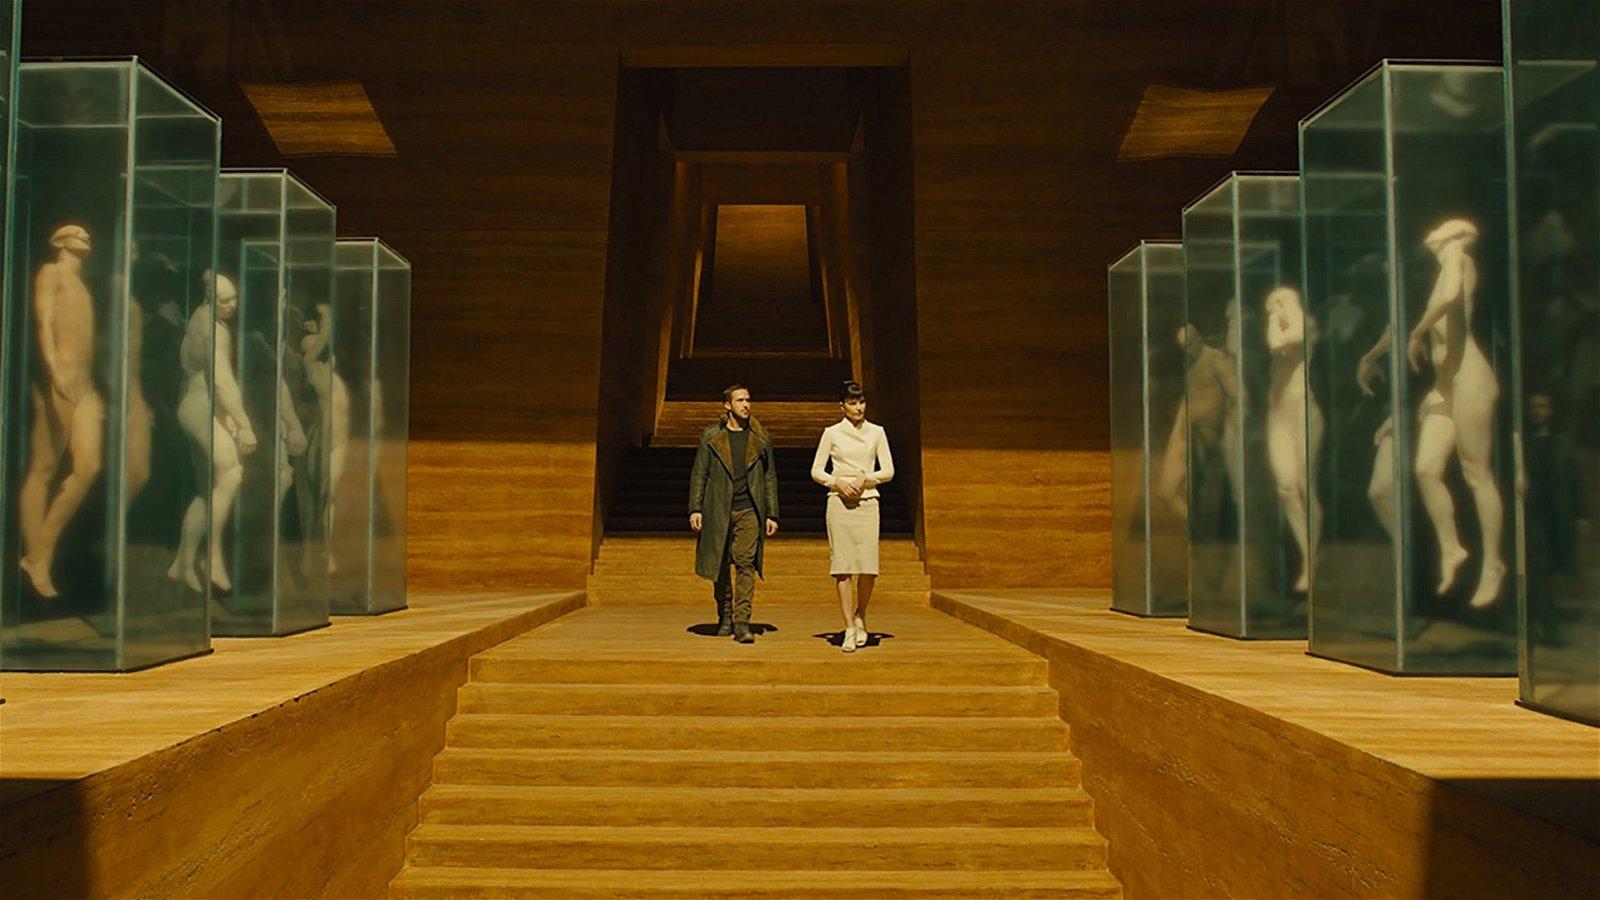 Blade Runner 2049 (2017) Review 2